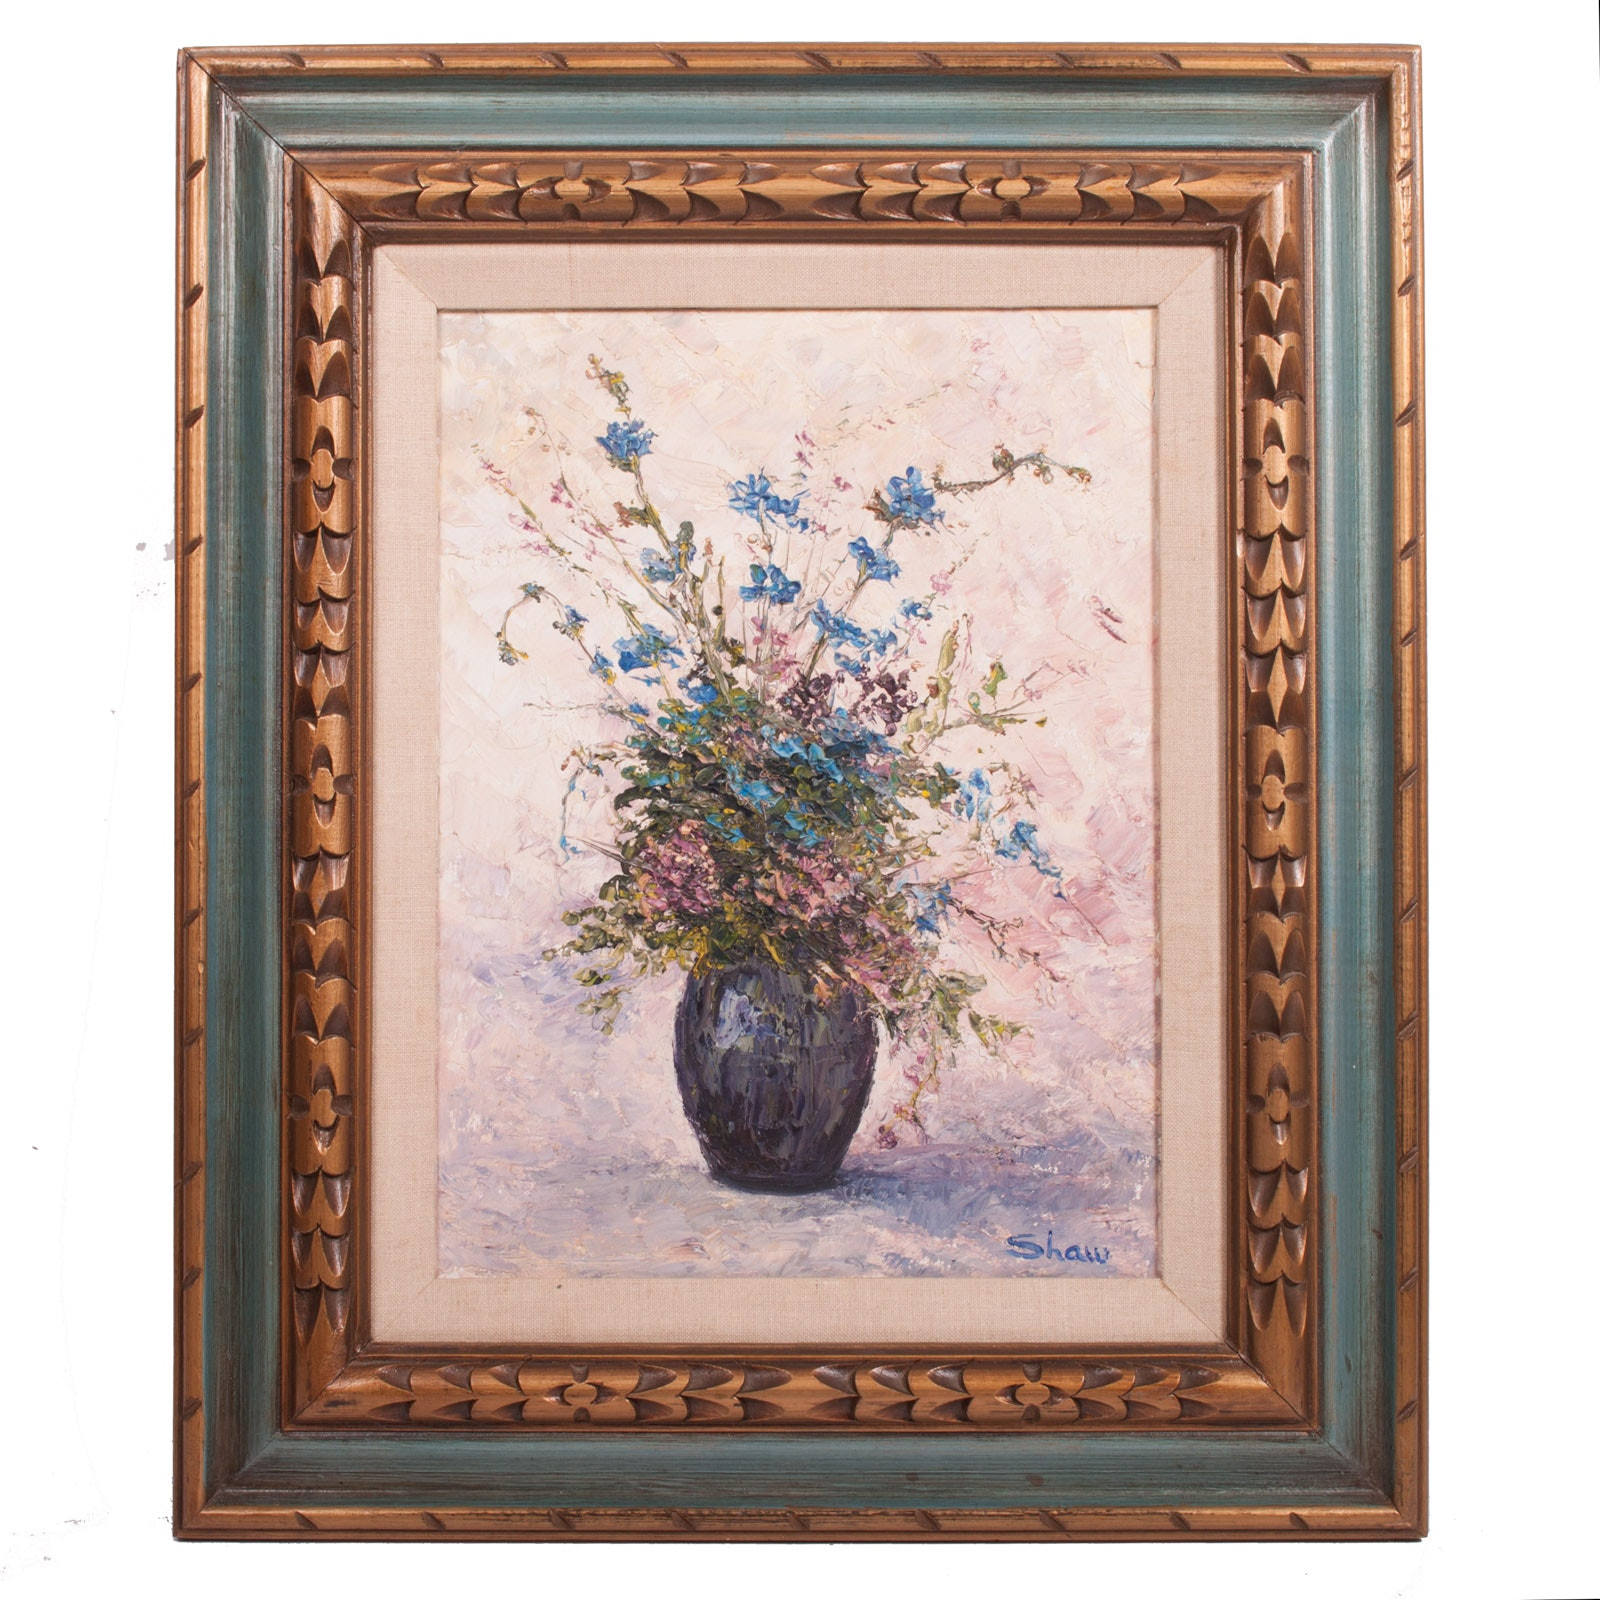 Signed Shaw Original Oil on Canvas Floral Still Life